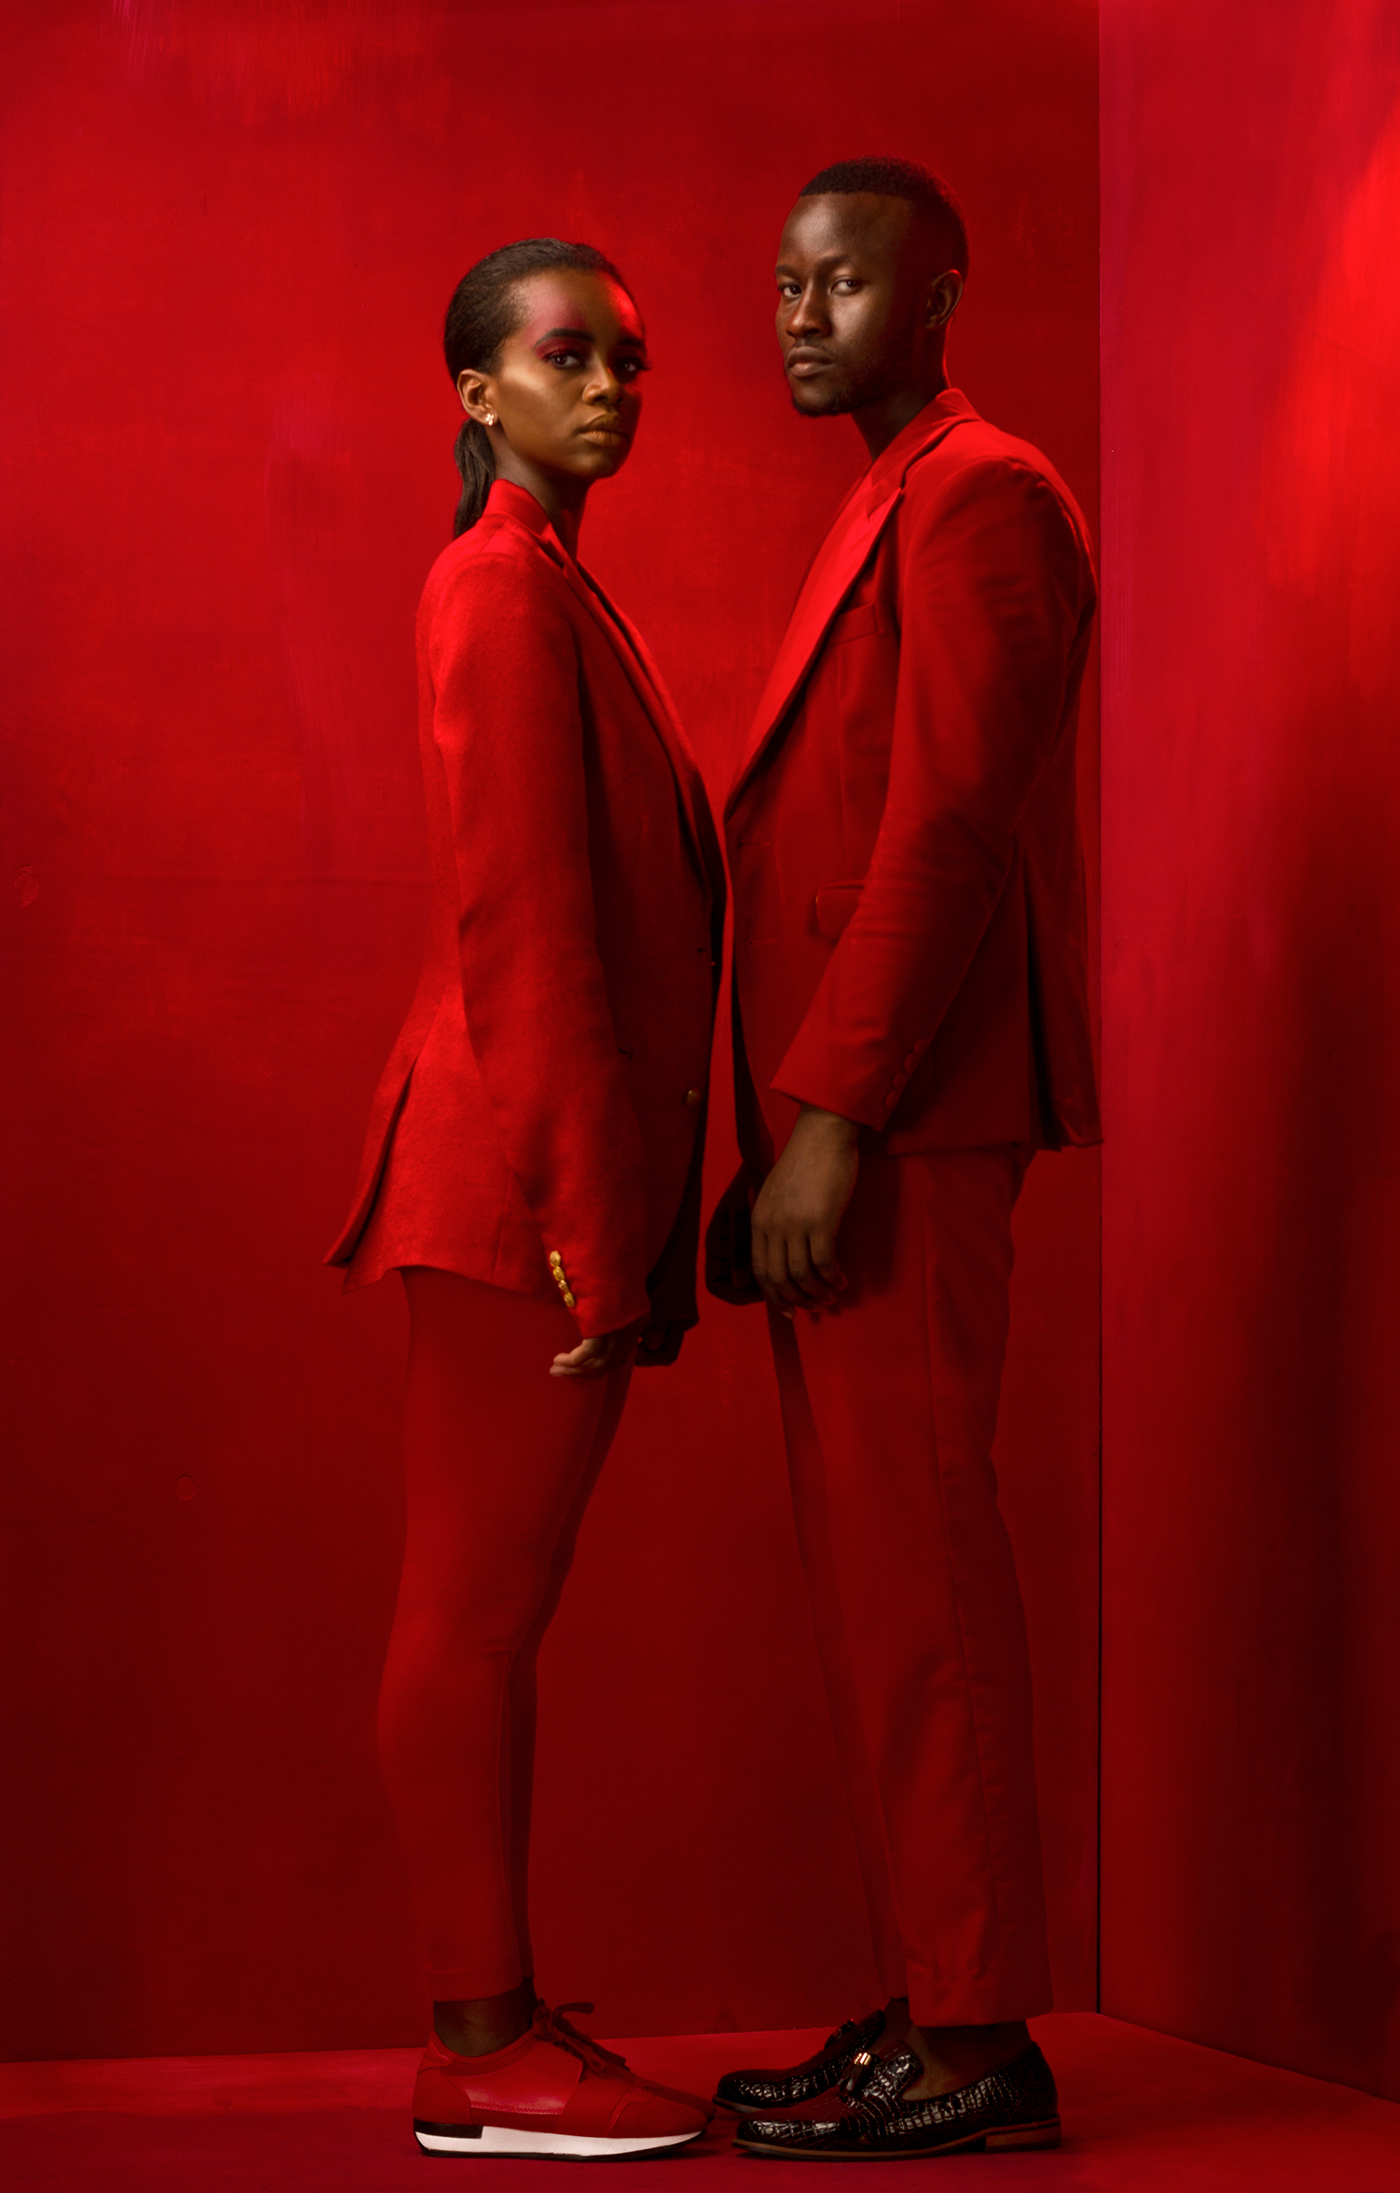 RED / фото Arthur Keef